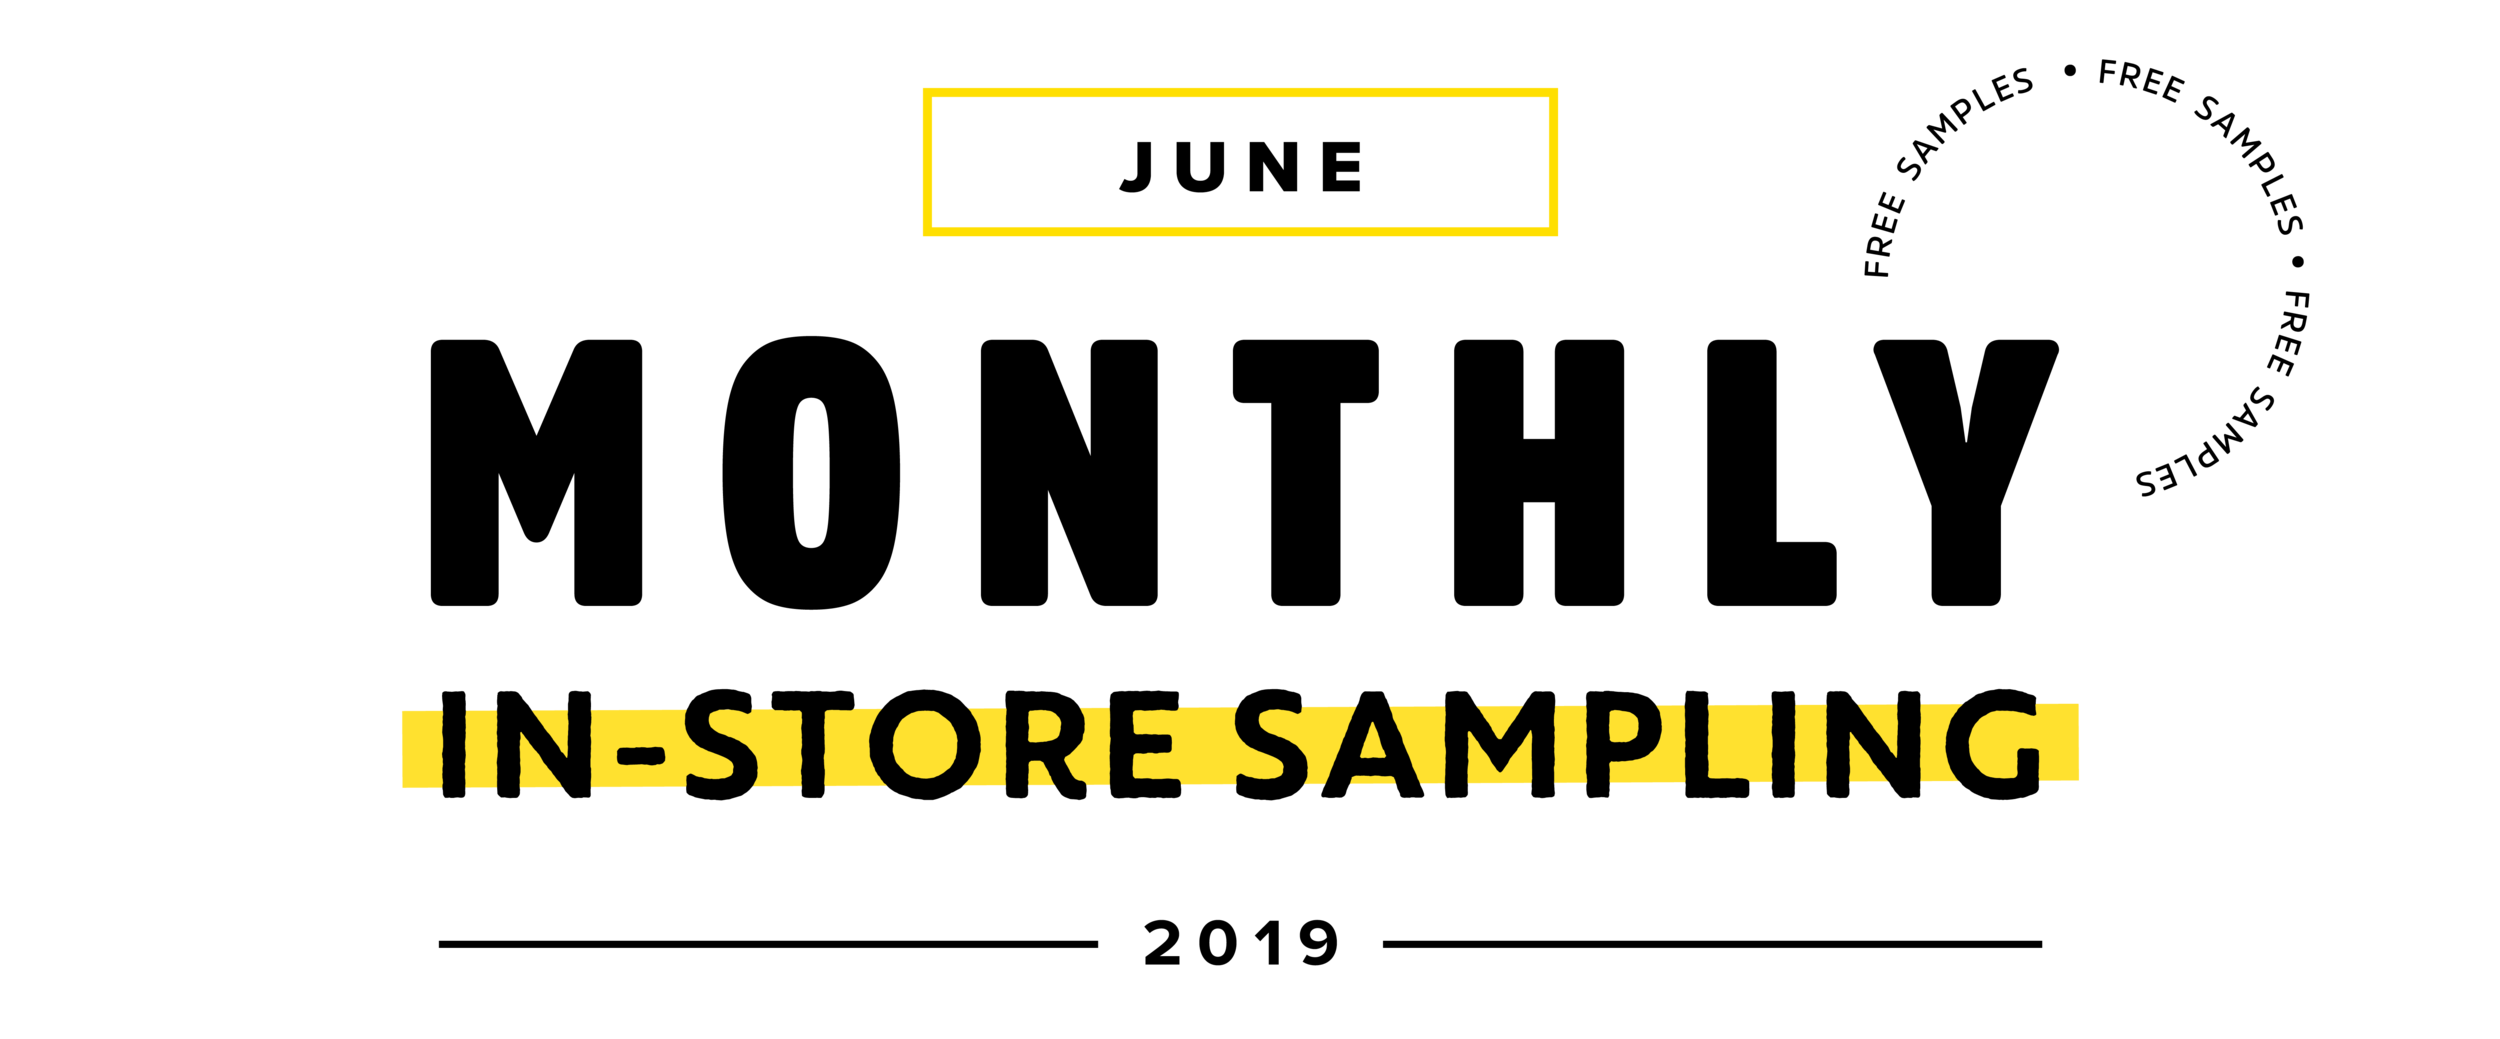 2019_june-monthly-instore-sampling.png